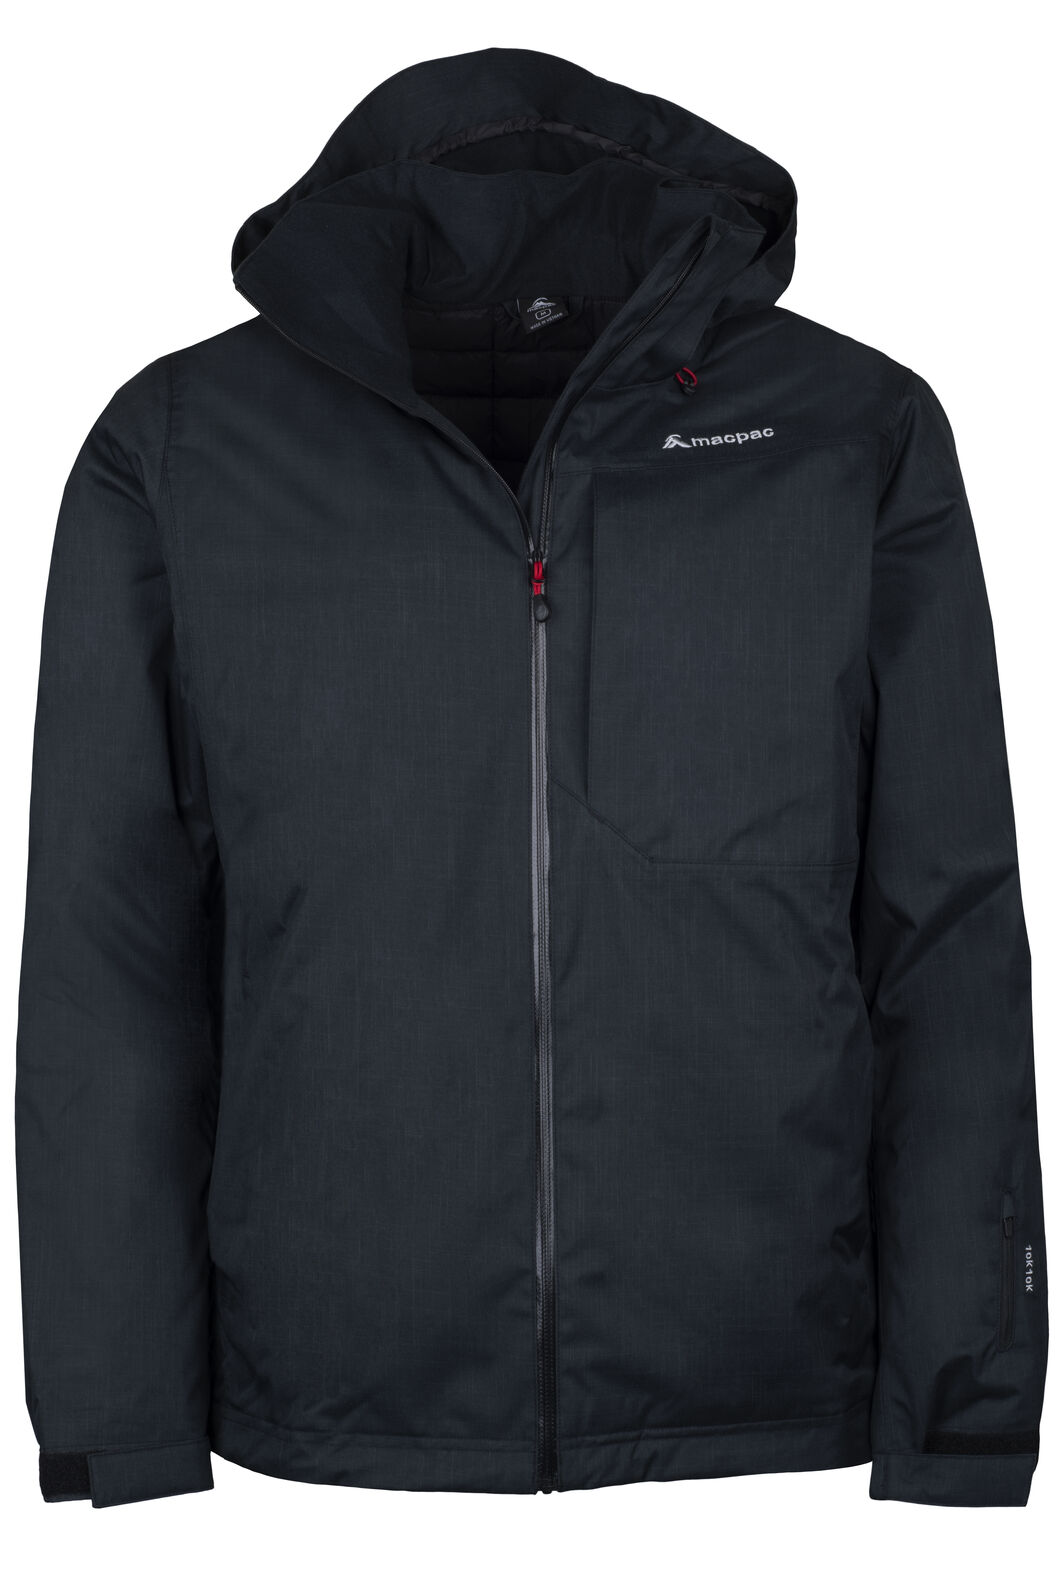 Powder Ski Jacket - Men's, Black/Black, hi-res